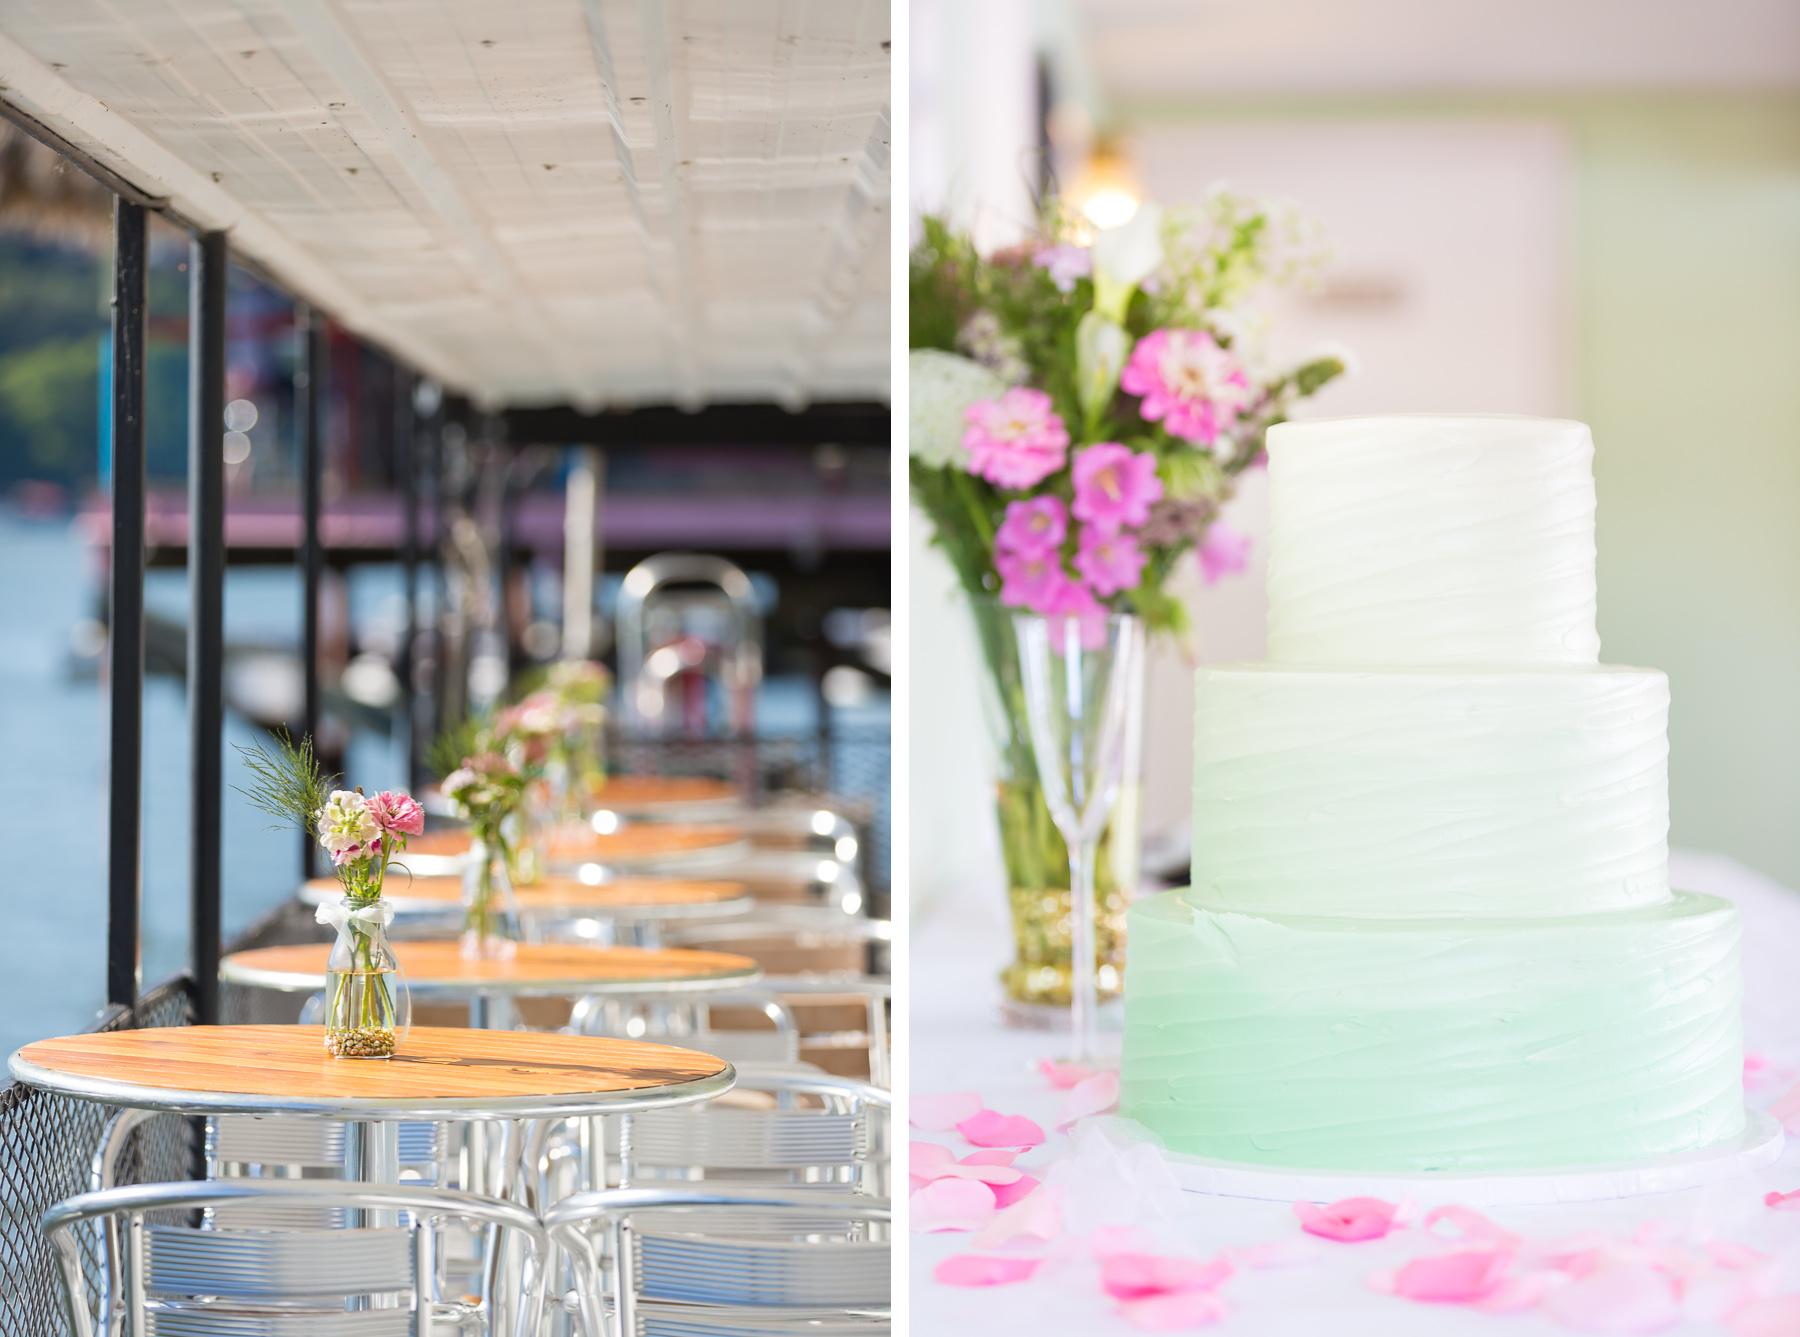 sweet-treats-wedding-cakes-austin-prickly-pair-farms.jpg